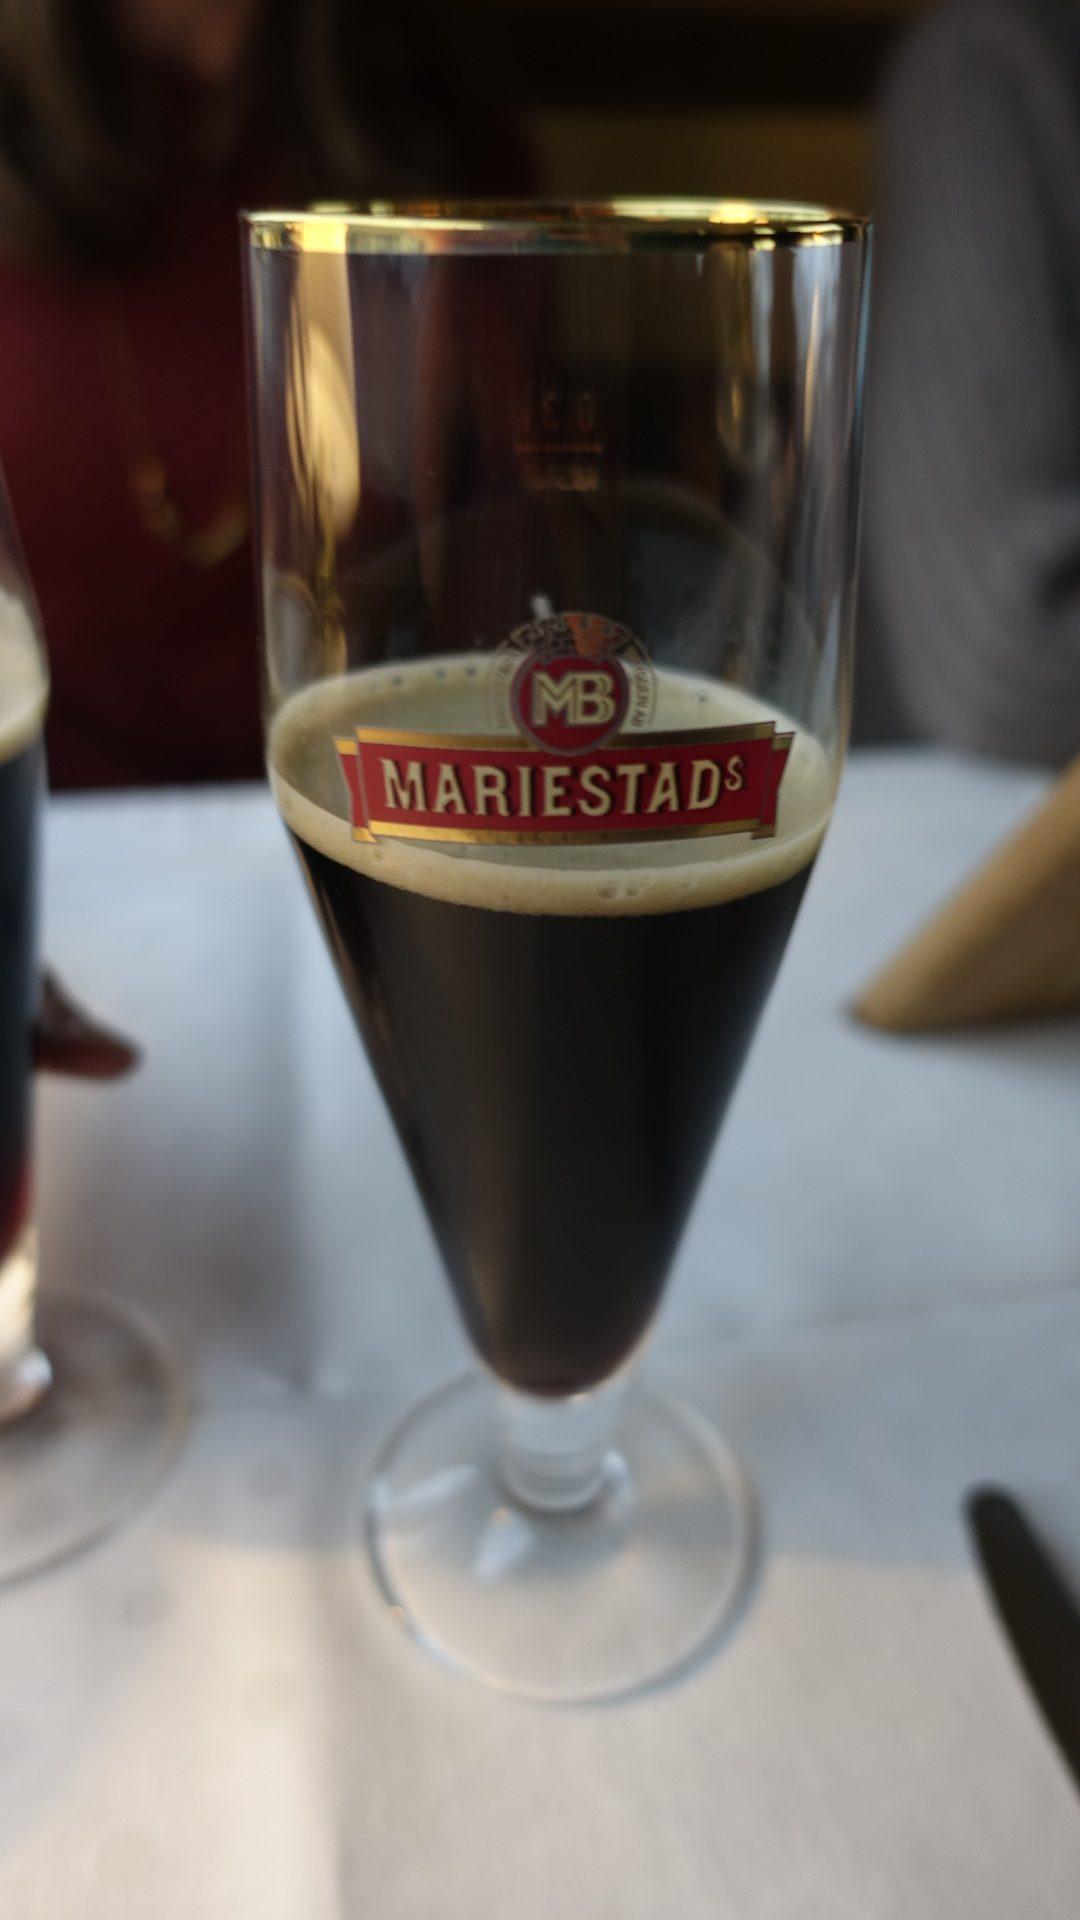 Mariestads Den stora smakresan